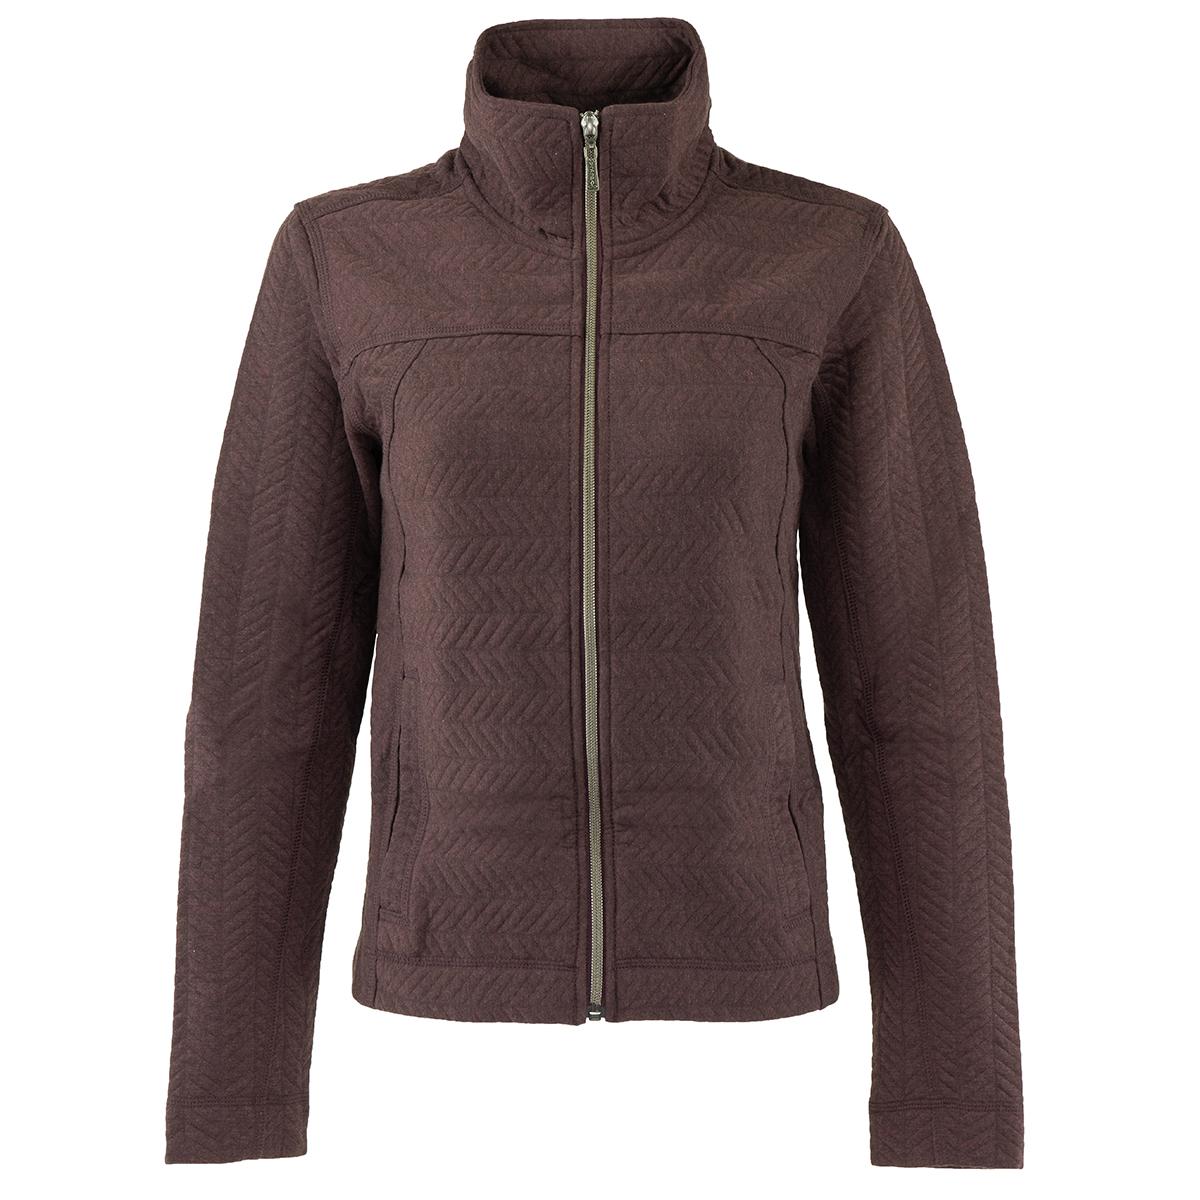 PrAna-Women-039-s-Hadley-Jacket